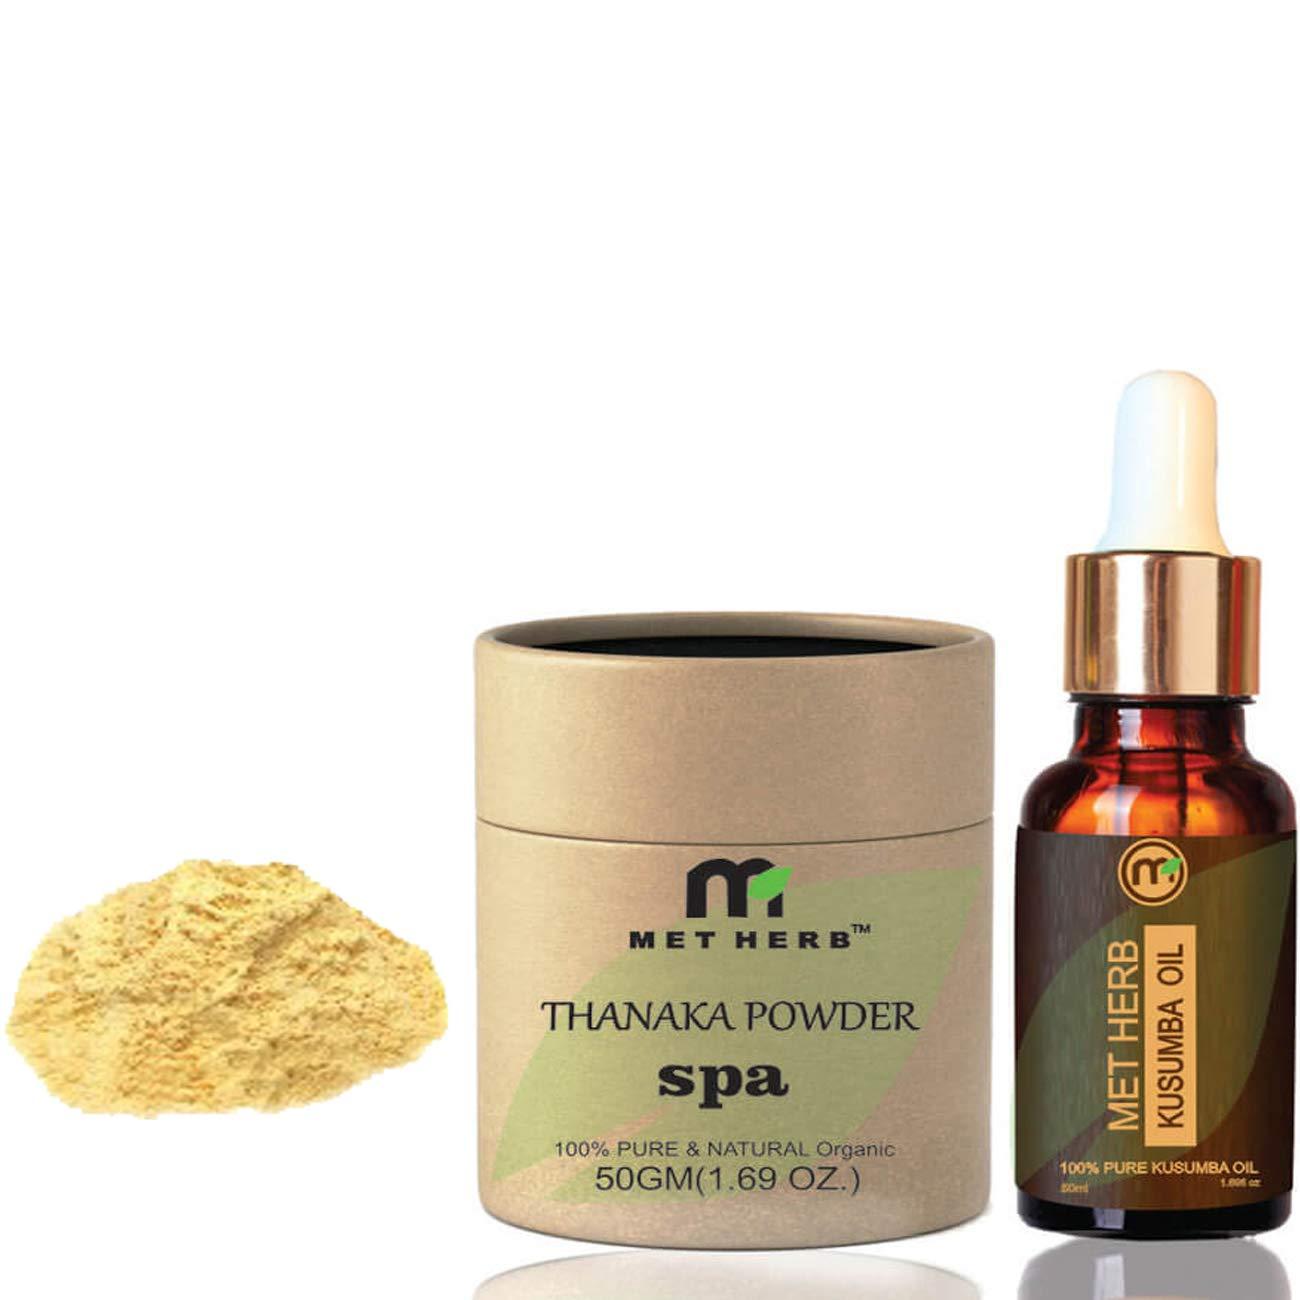 Pure & Natural Thanaka powder 50g & Kusumba oil 50ml for permanent hair removal Eco-Friendly Packing …